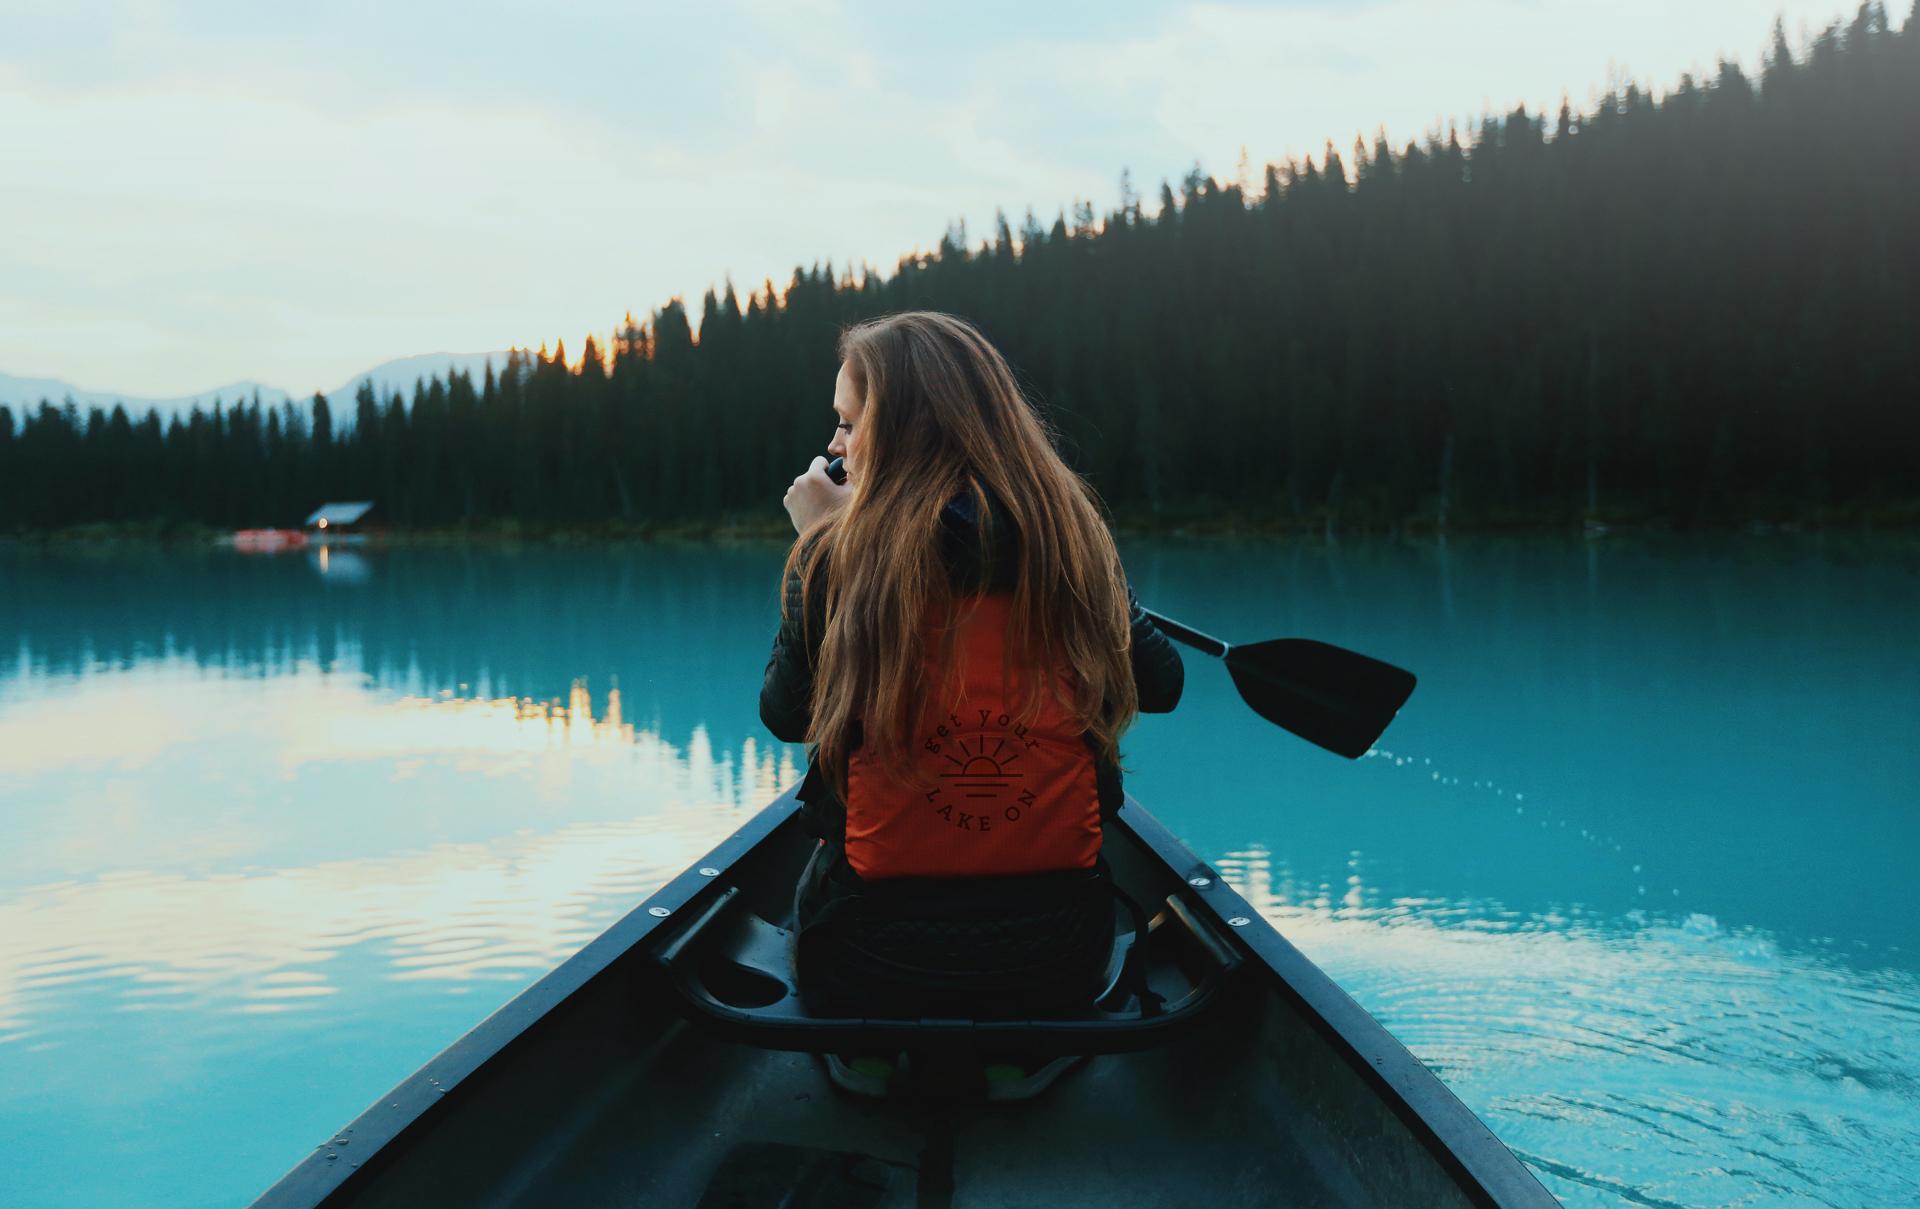 Lake On Company | Get Your Lake On